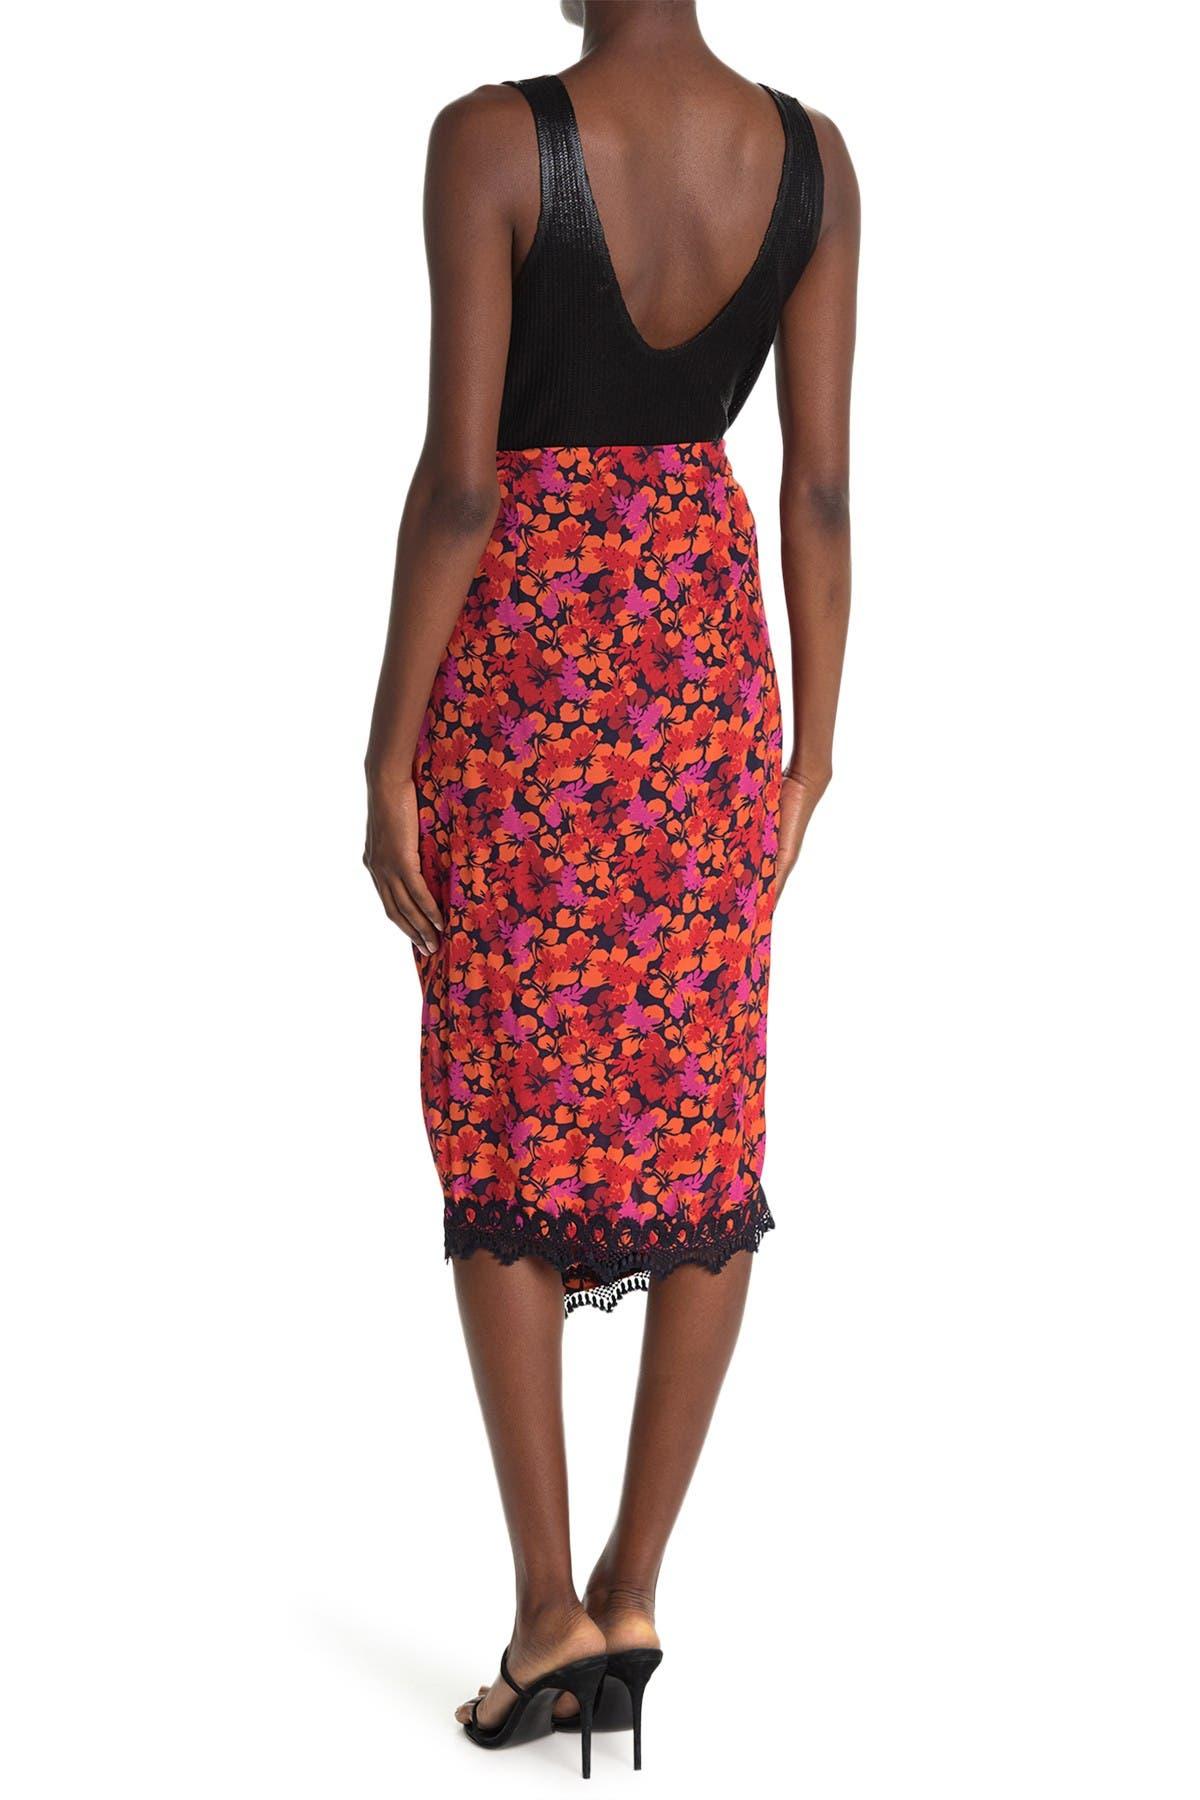 Image of DEREK LAM 10 CROSBY Liona Lace-Trim Printed Wrap Skirt